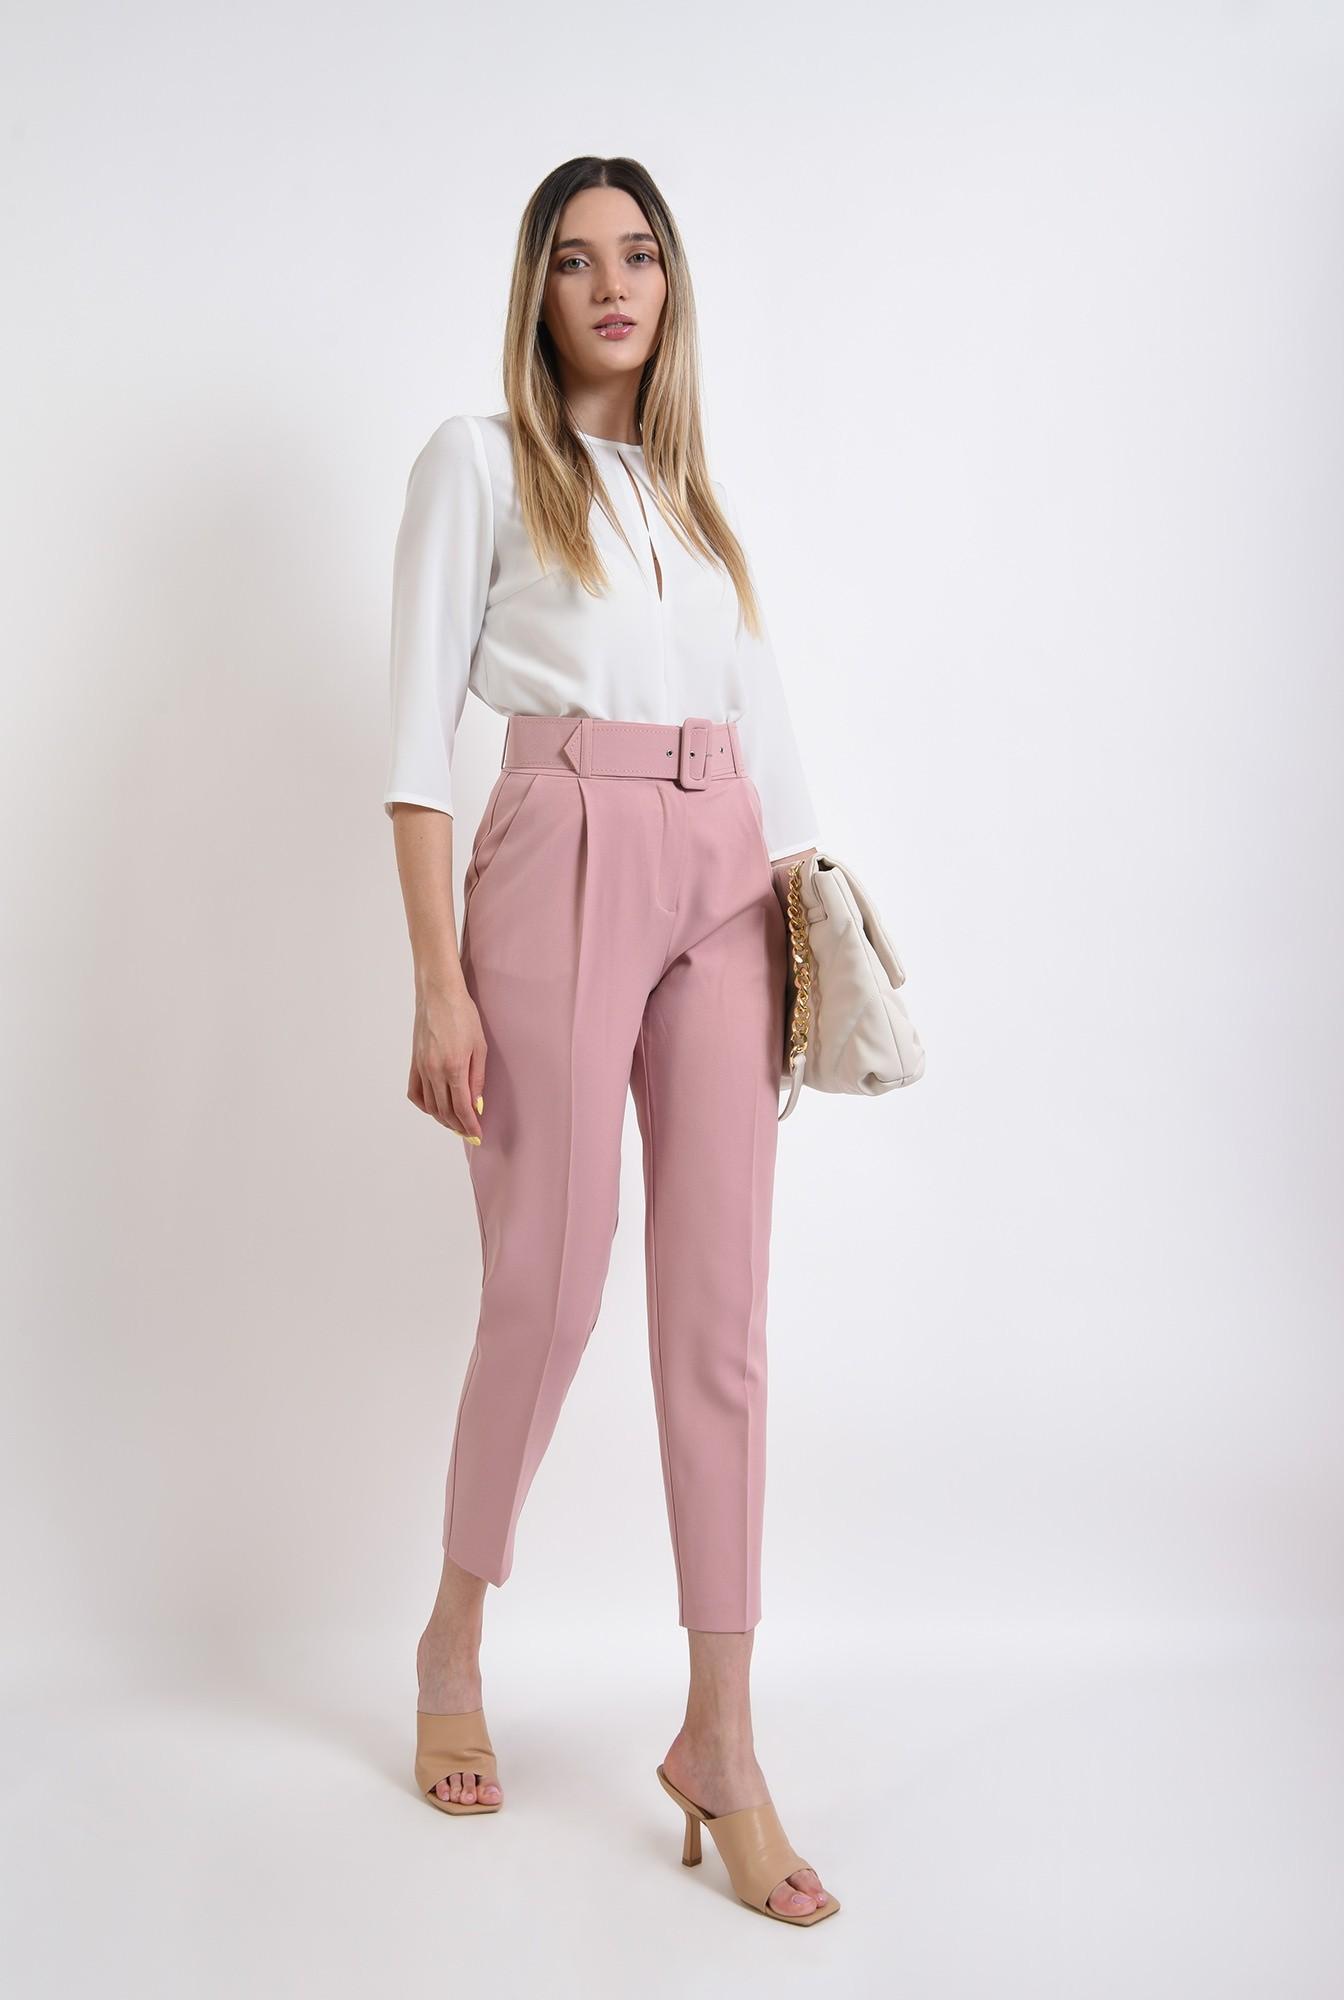 0 - pantaloni lungi, cu talie inalta, cu buzunare laterale